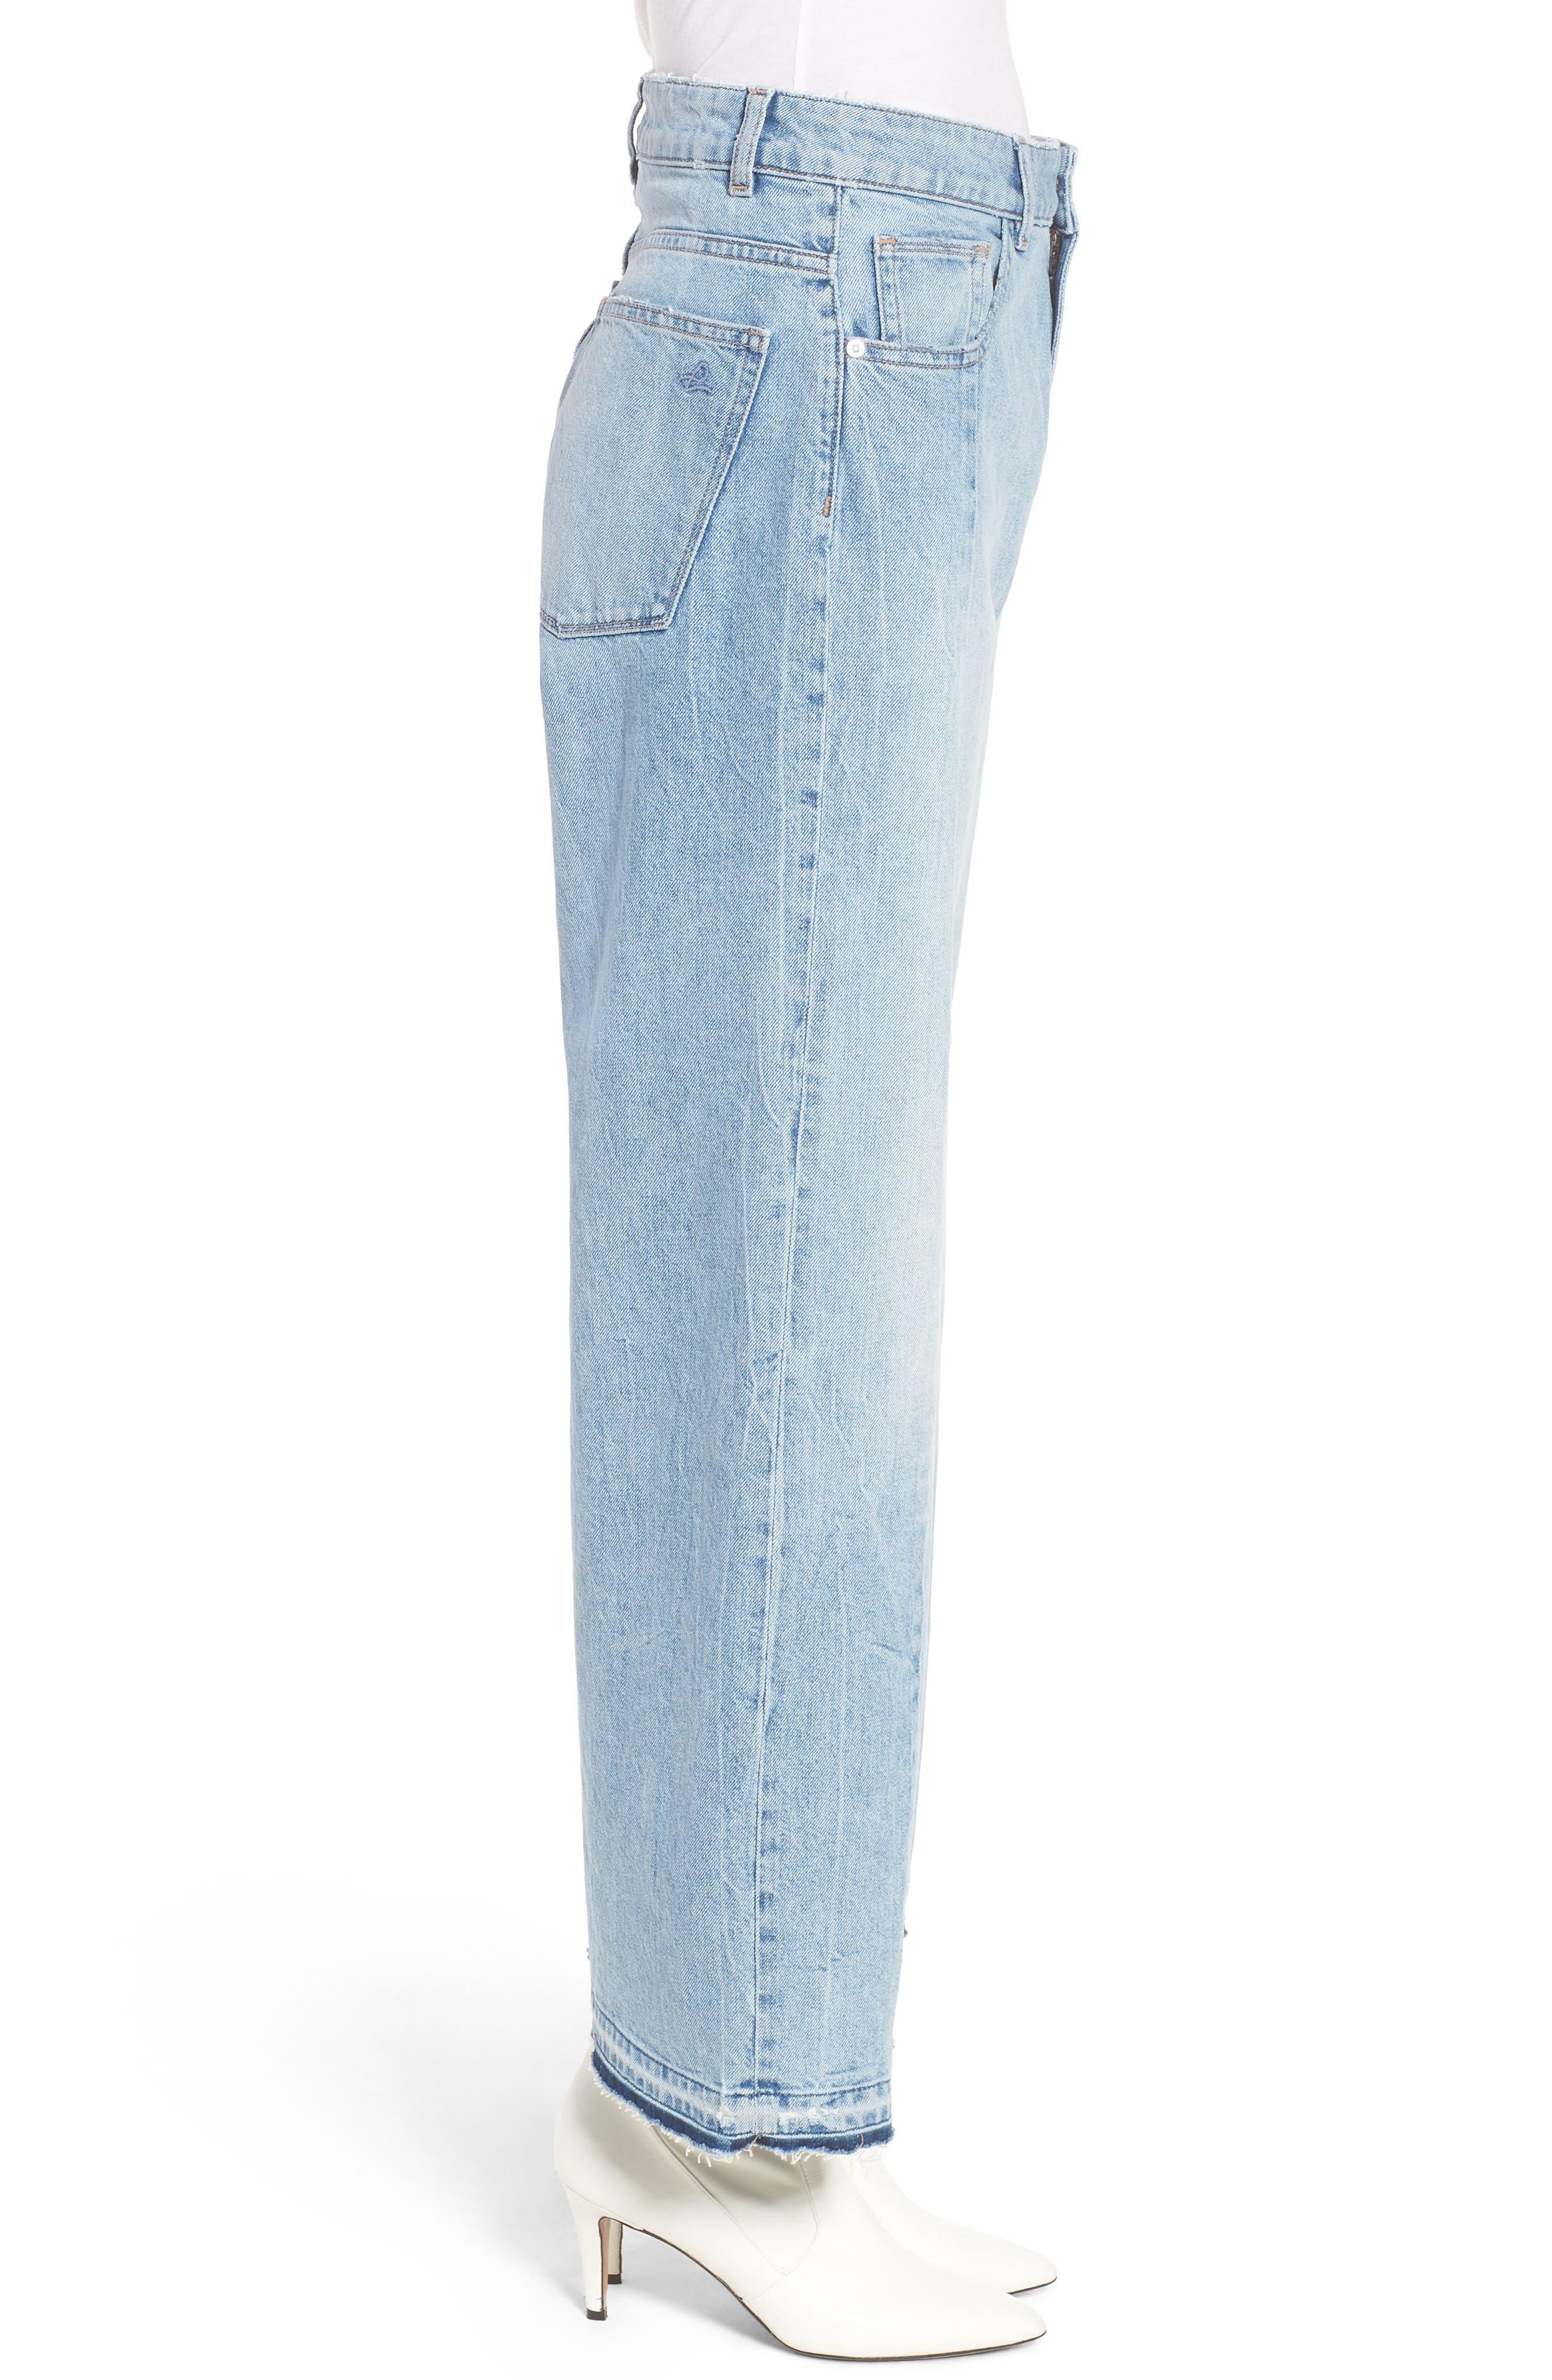 Hepburn High Waist Wide Leg Jeans,                             Alternate thumbnail 3, color,                             428